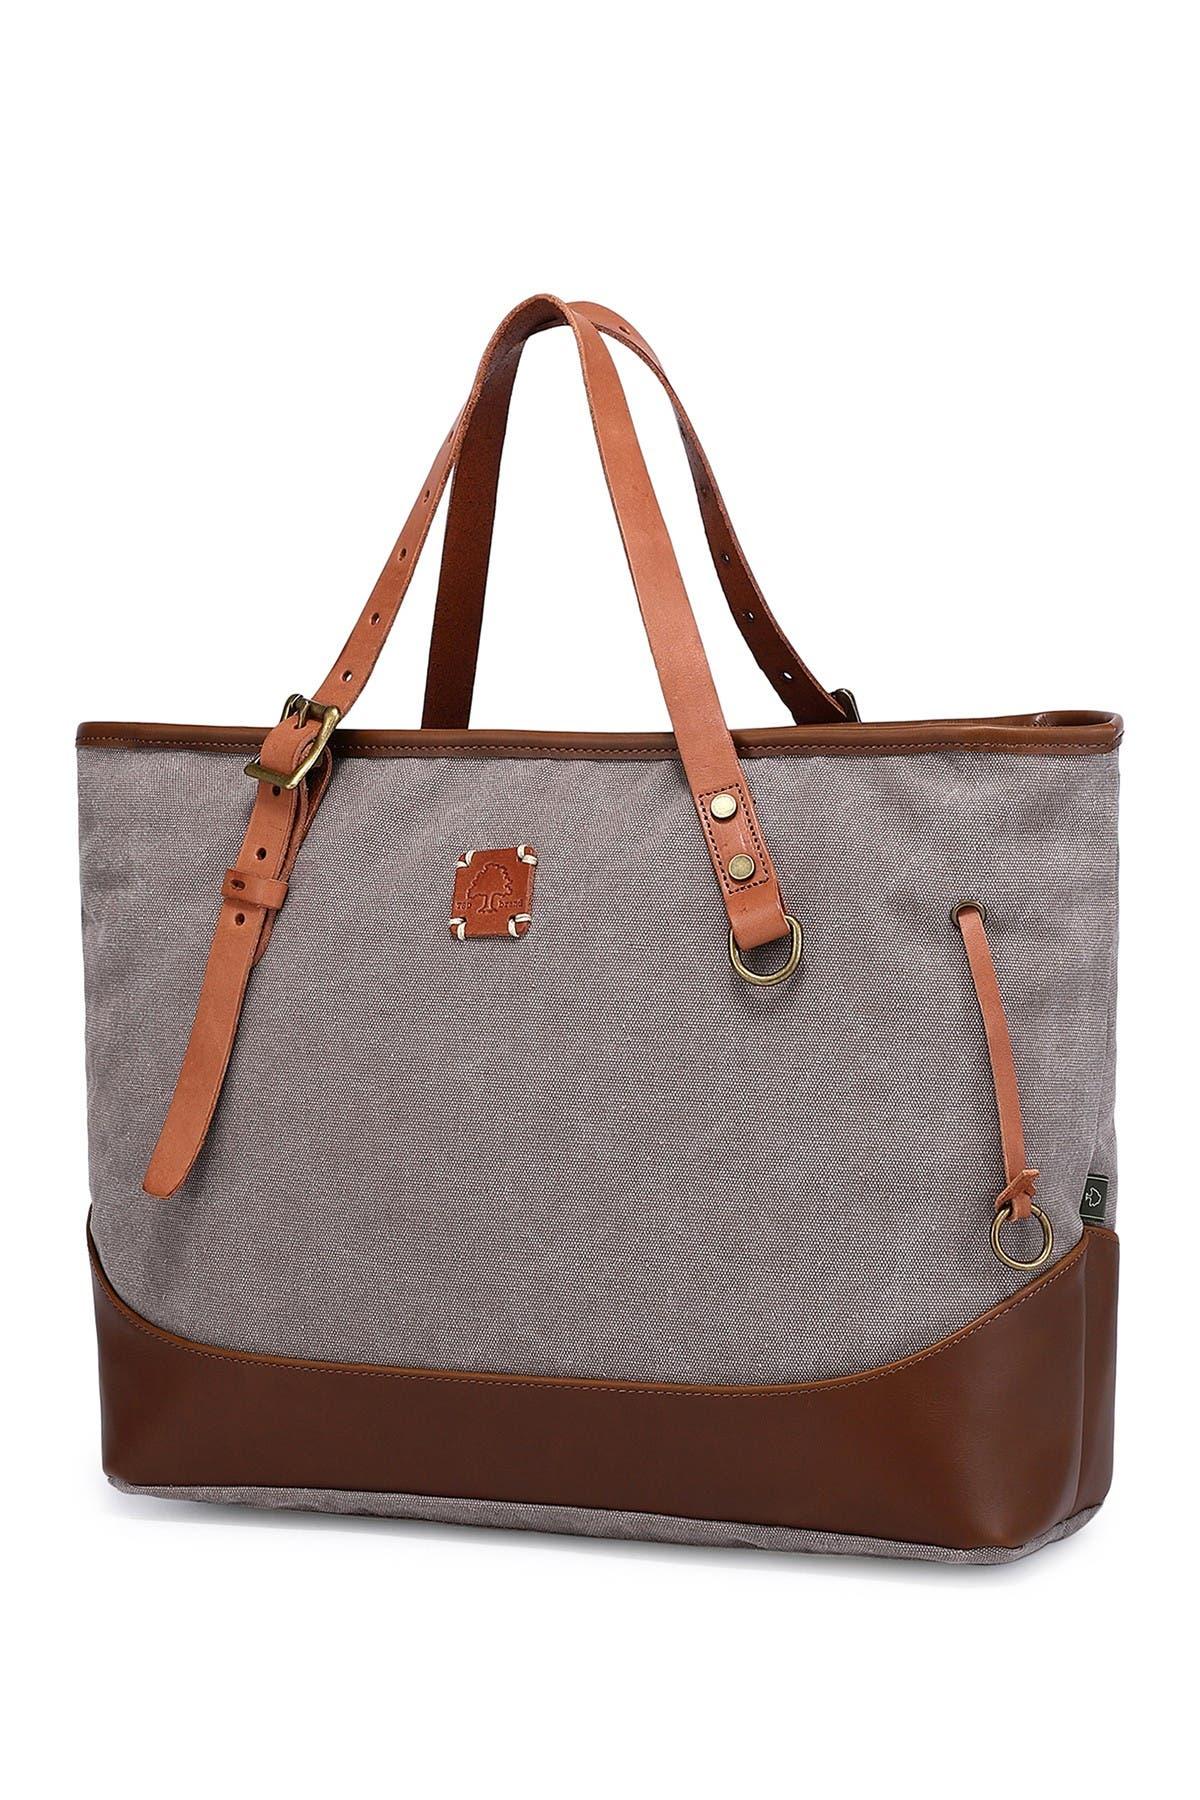 Image of TSD Redwood Canvas Shopper Bag